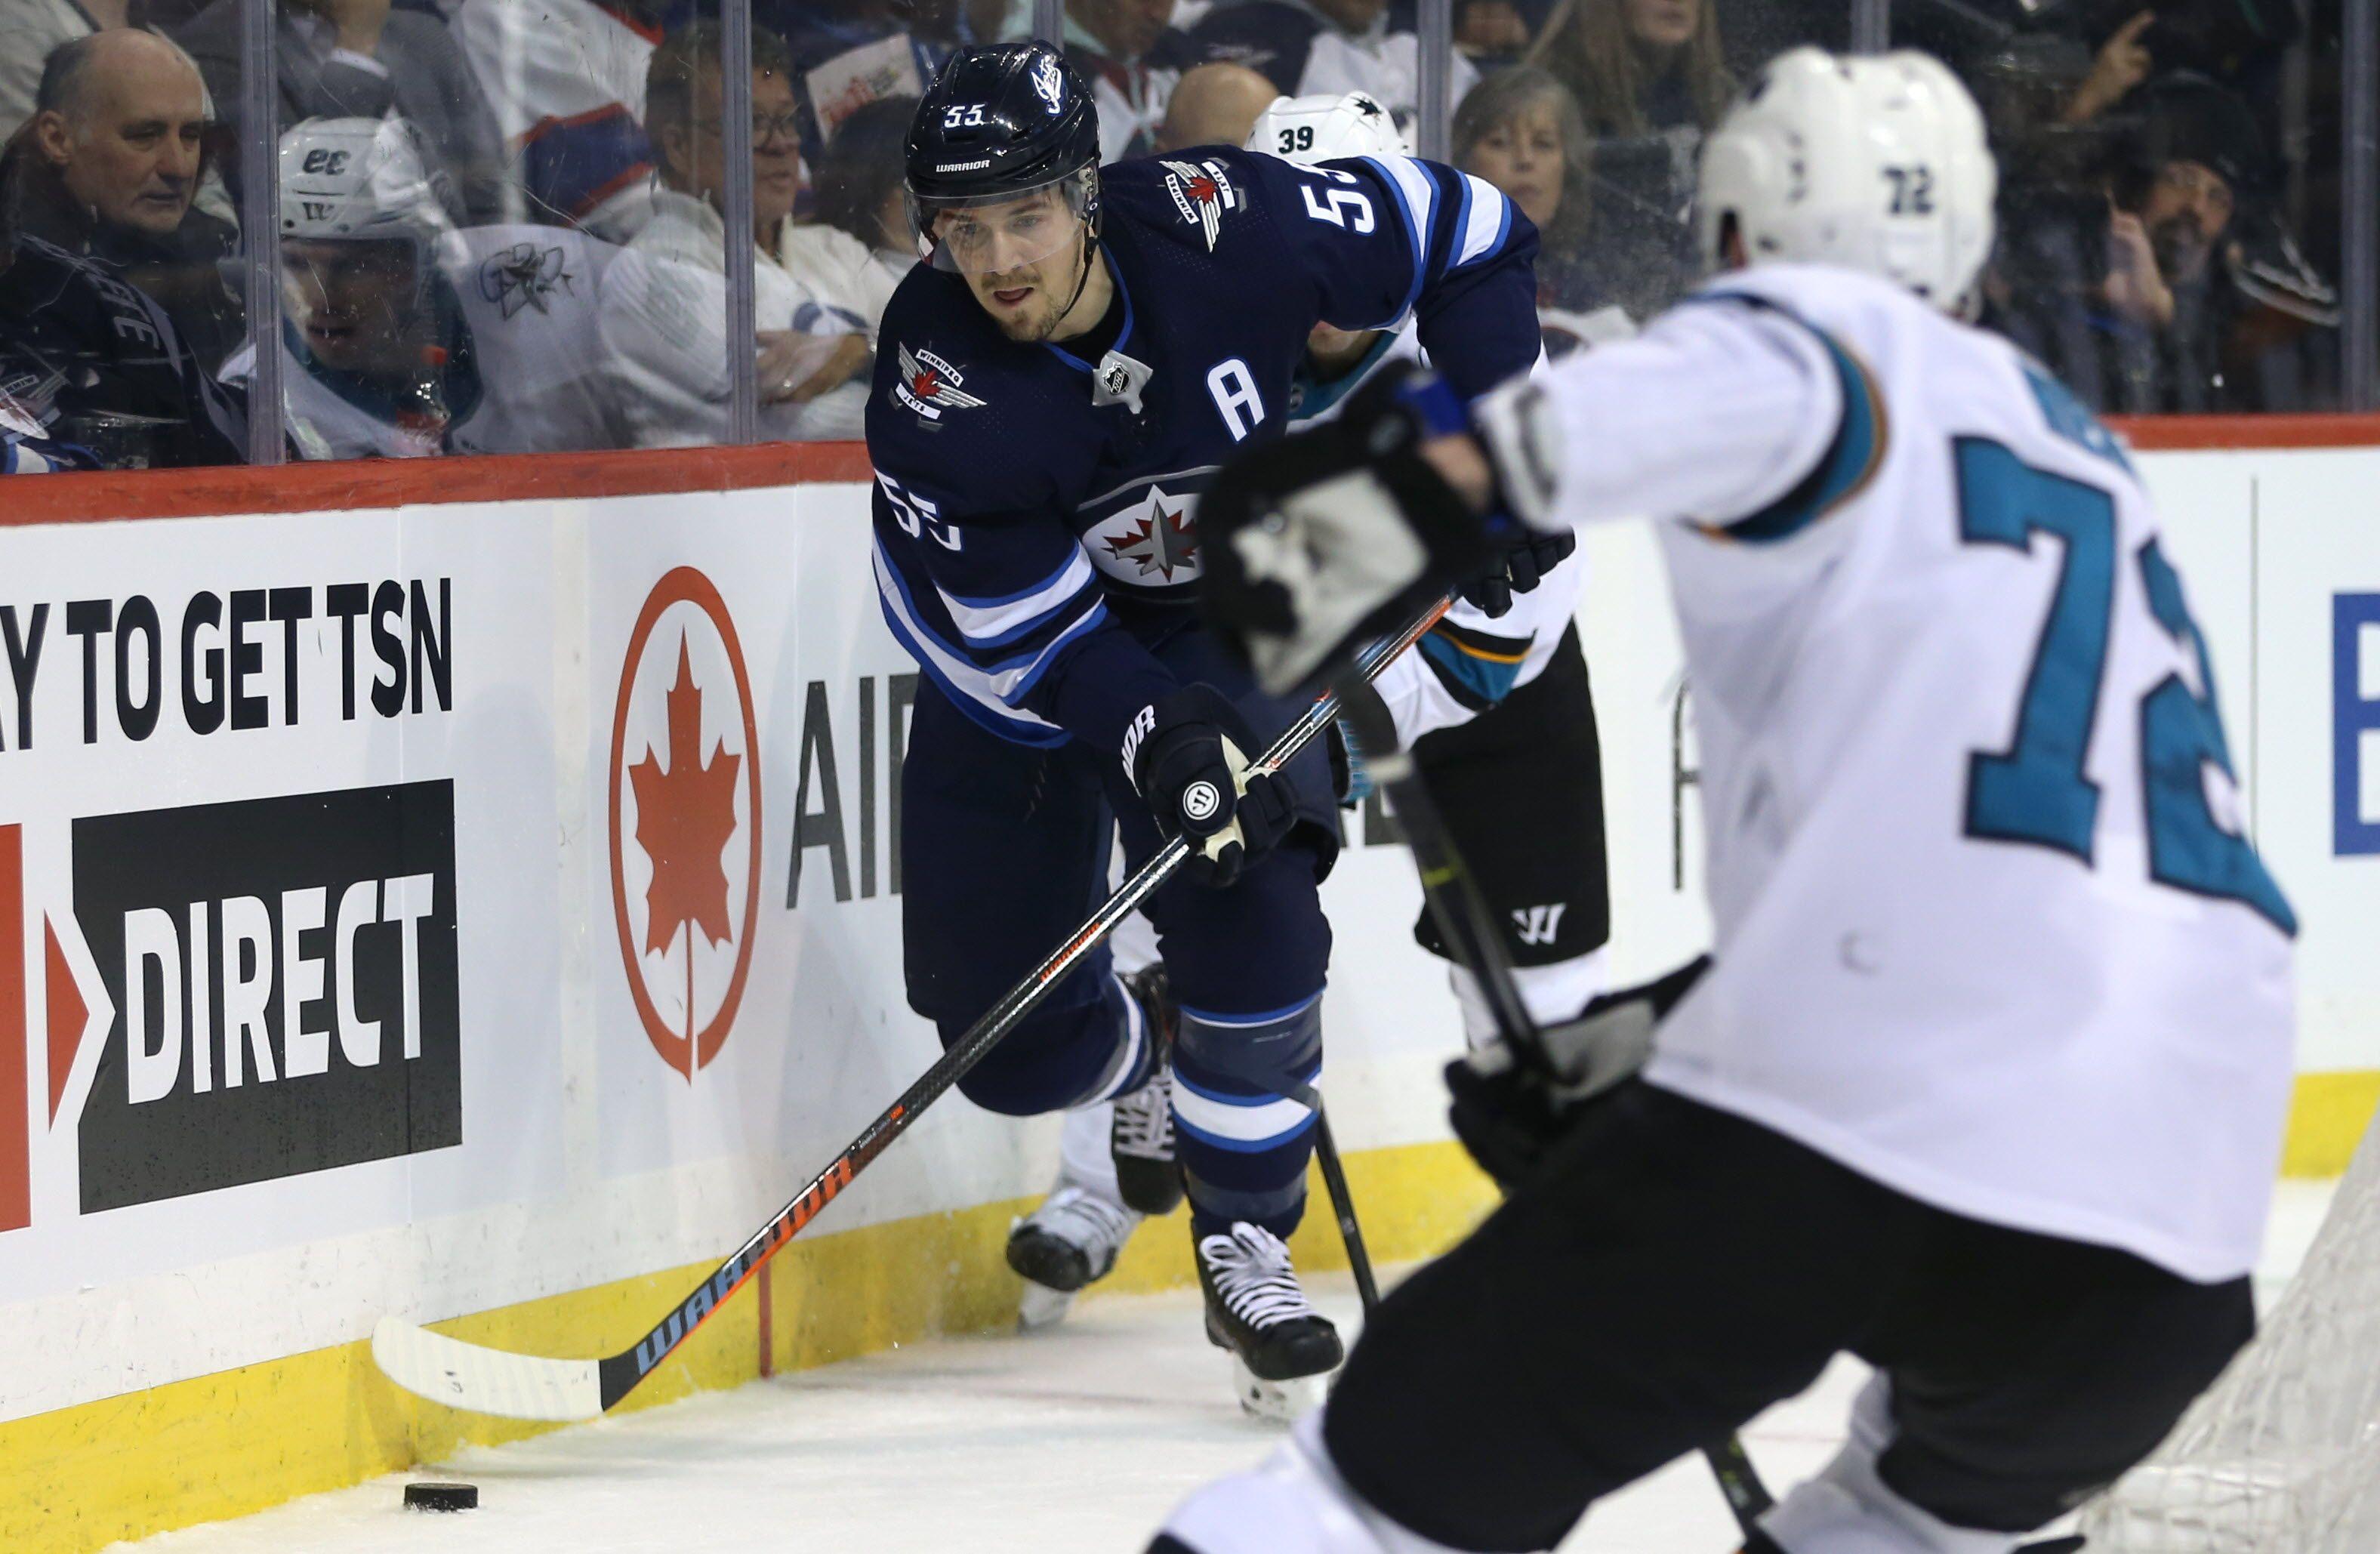 Game Day Sharks At Jets National Football League News San Jose Sharks 24 28 4 Vs Winnipeg Jets In 2020 National Football Football League National Football League